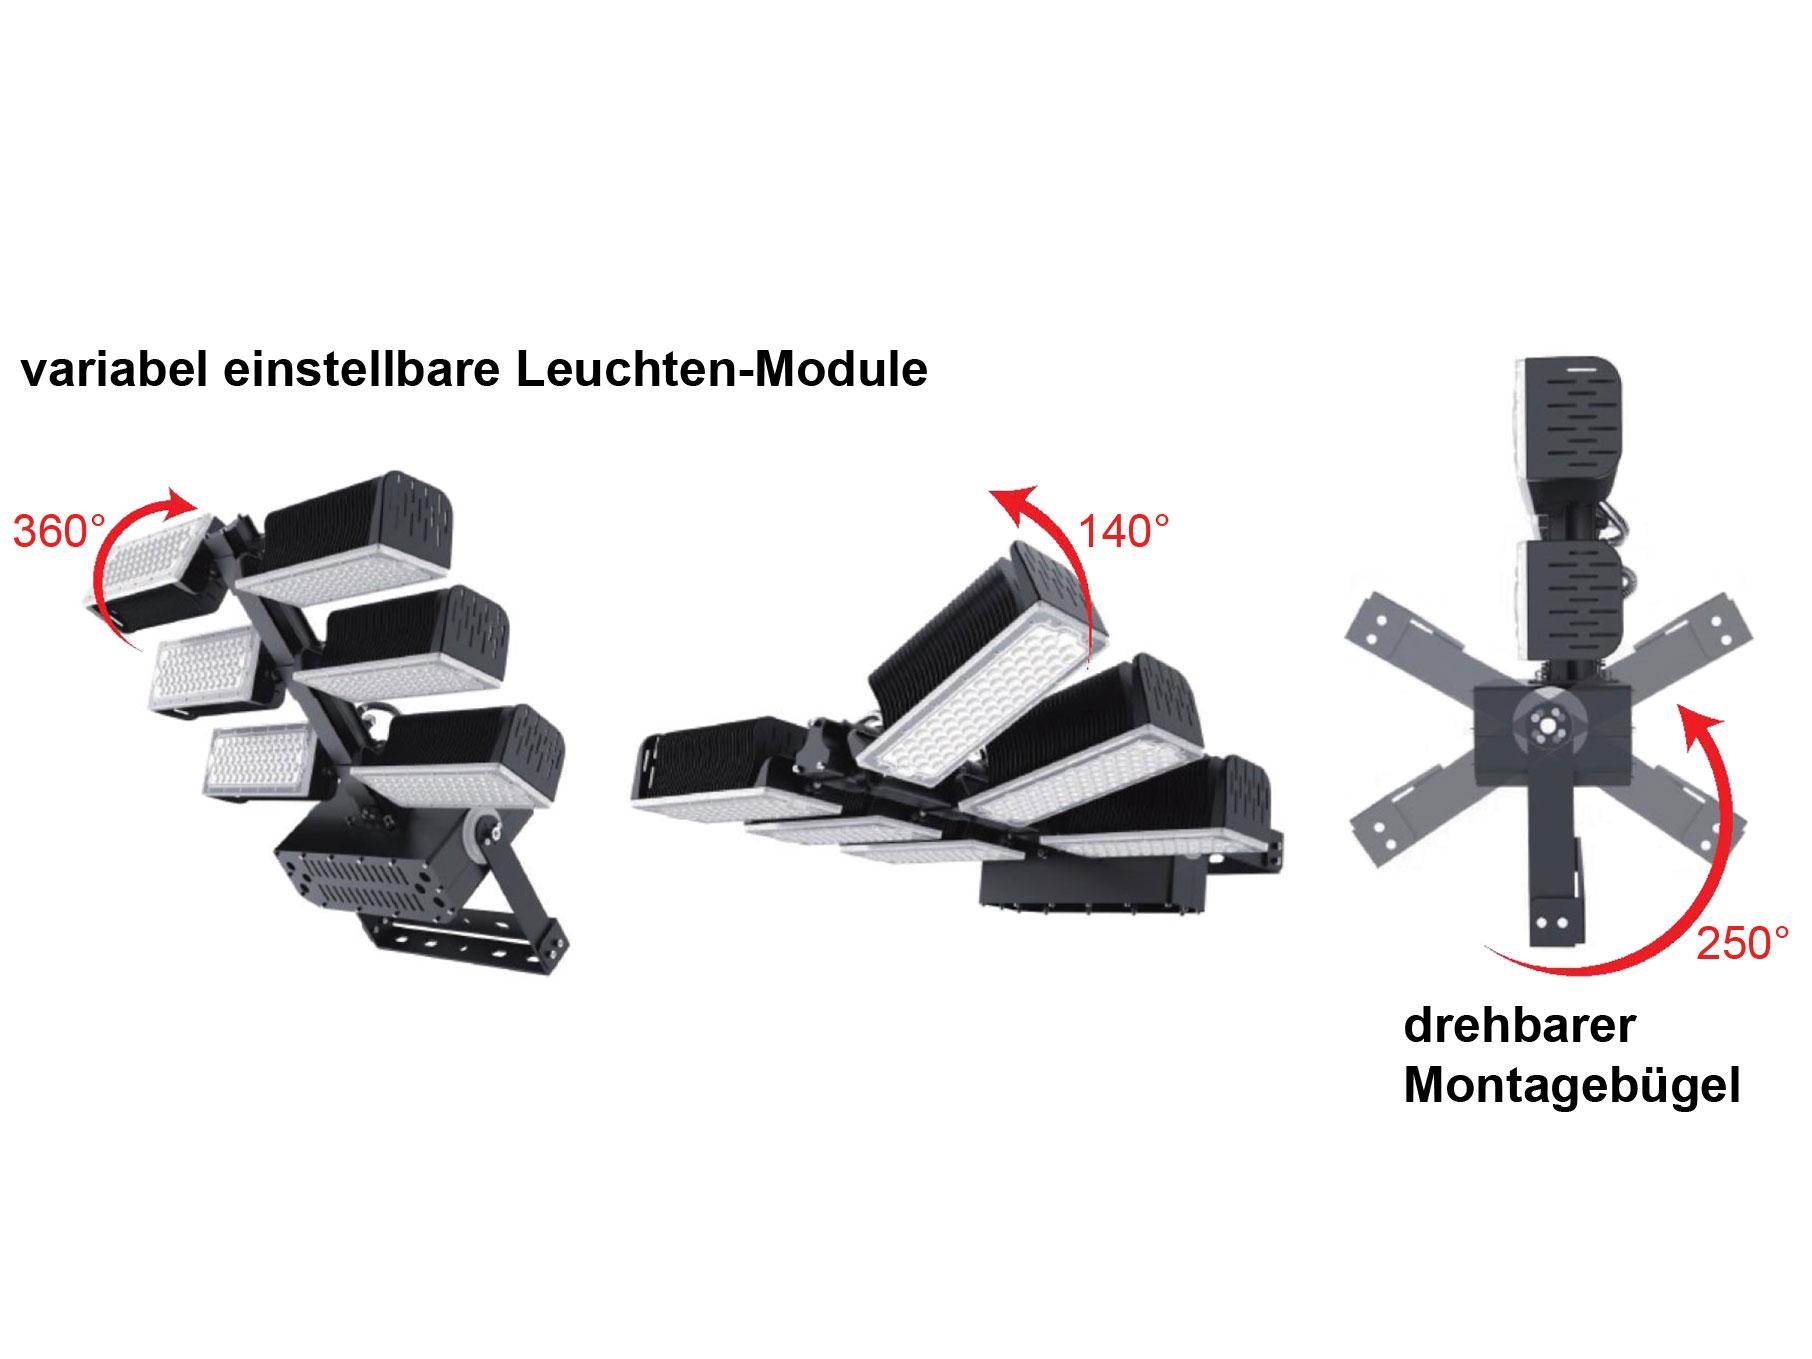 LEDAXO LED-Universalstrahler HRS-08 mit variabel einstellbaren Leuchten-Module